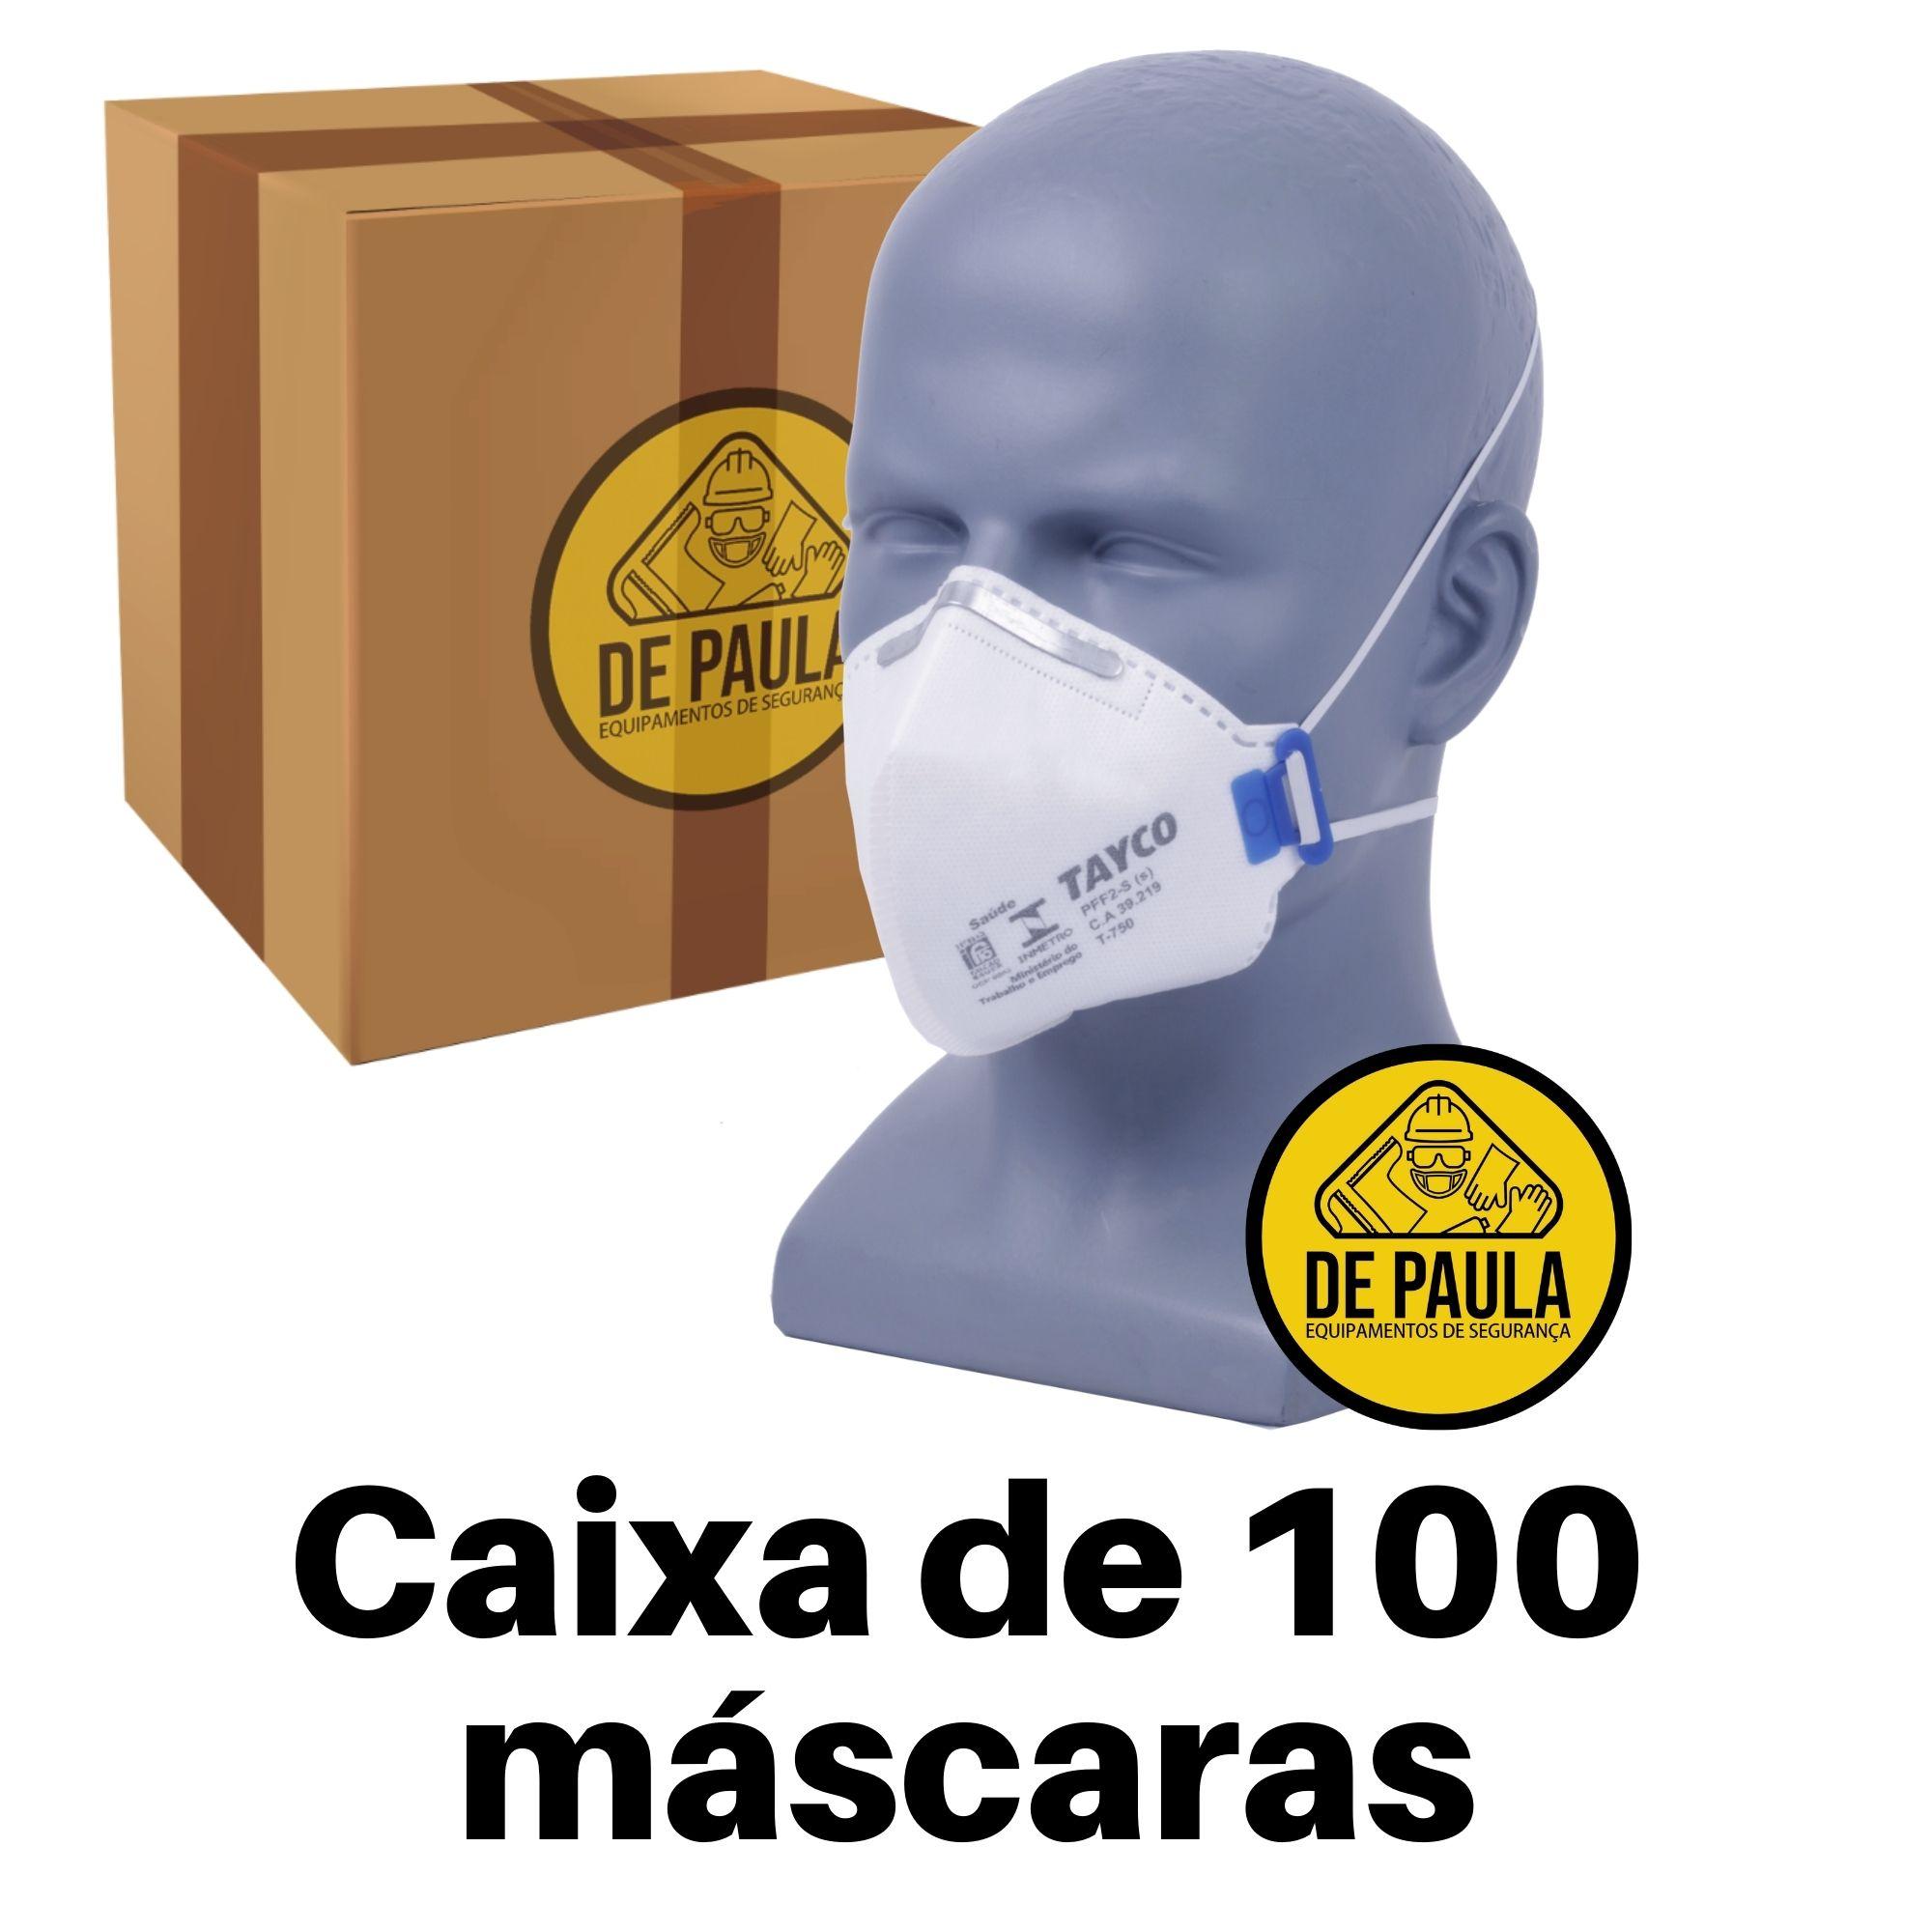 CAIXA DE 100 UNID - MASCARA PFF2  -S SEM VALVULA BRANCA TAYCO  - DE PAULA EPI